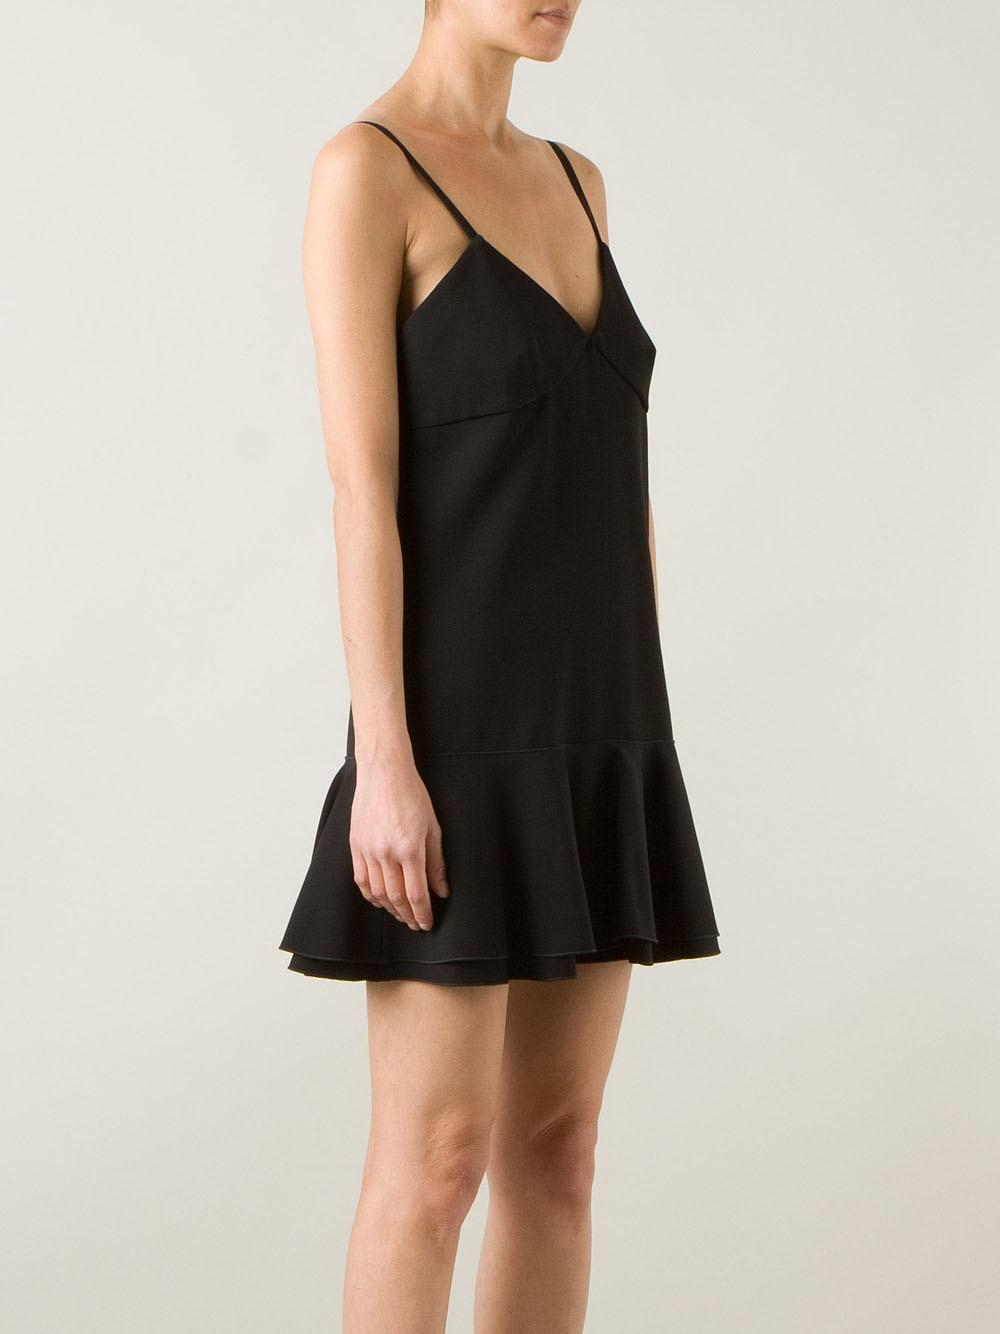 Victoria Beckham Crepe Ruffle Mini Dress In Black Lyst